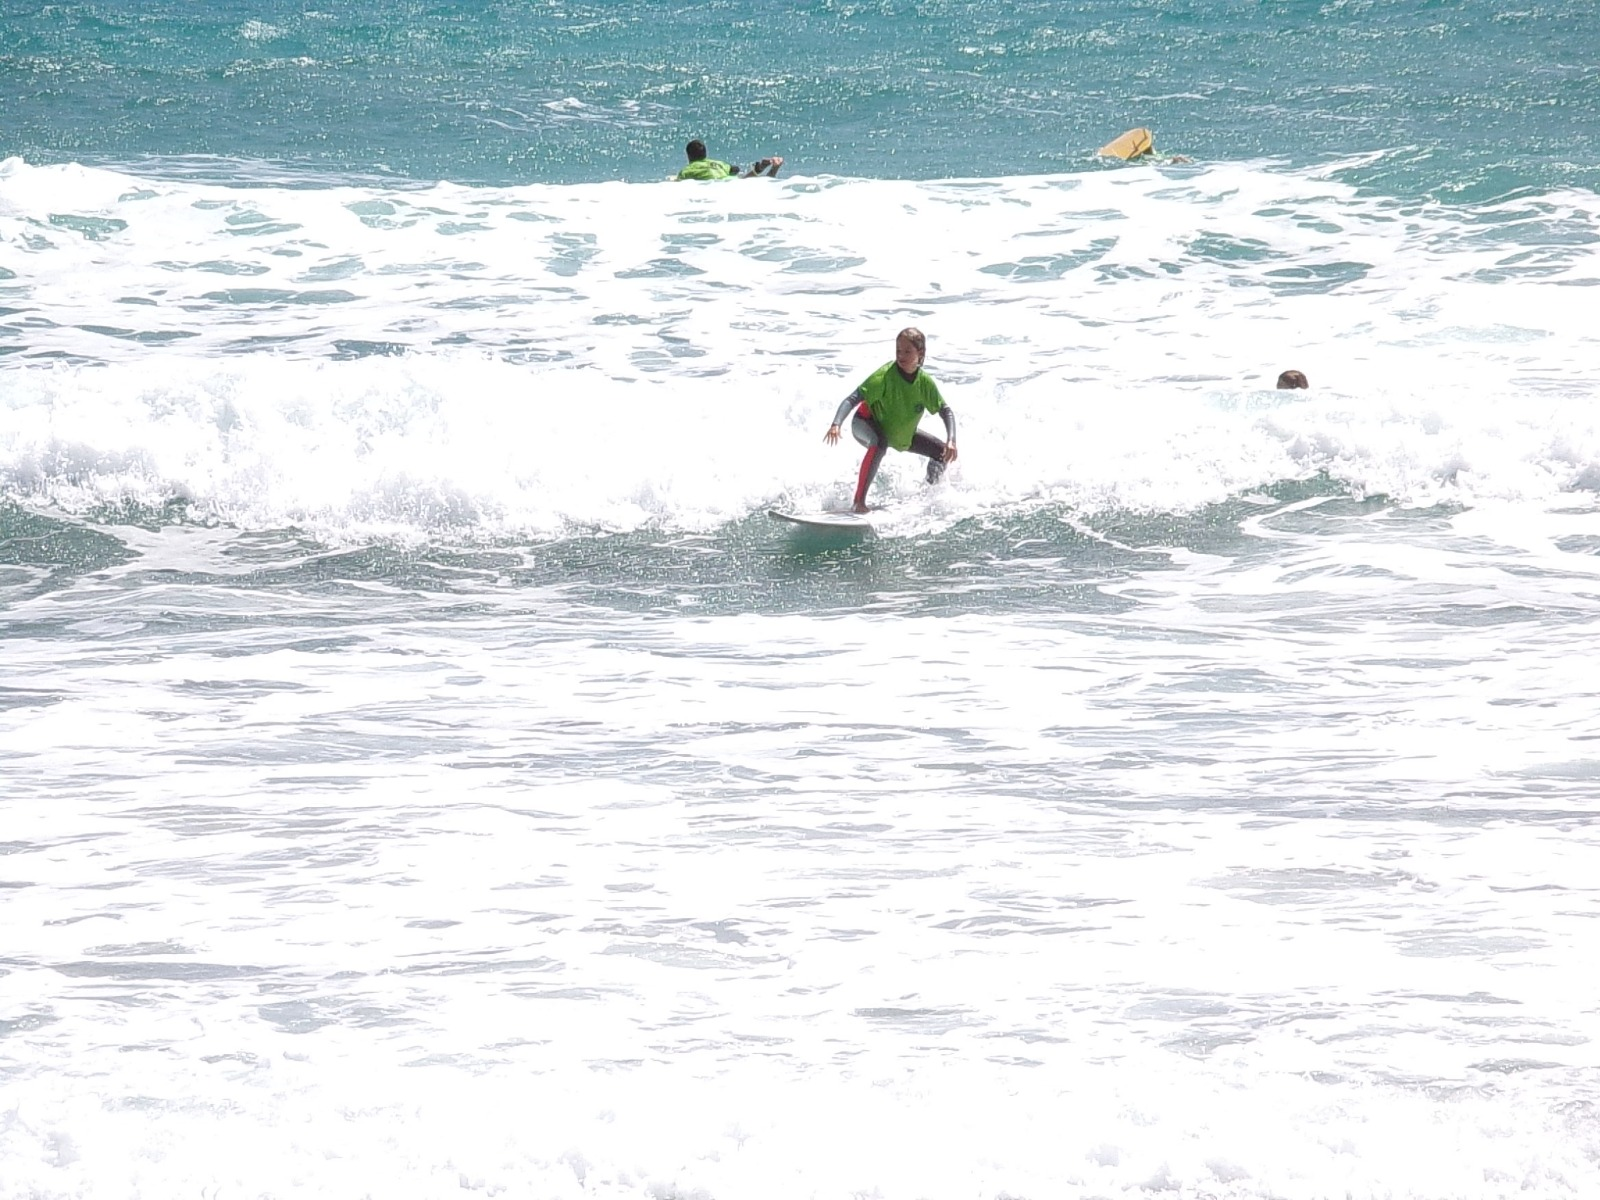 VERANO 2019 2 FUERTE TRIBU SURFWhatsApp Image 2019-08-15 at 15.49.44.jpeg